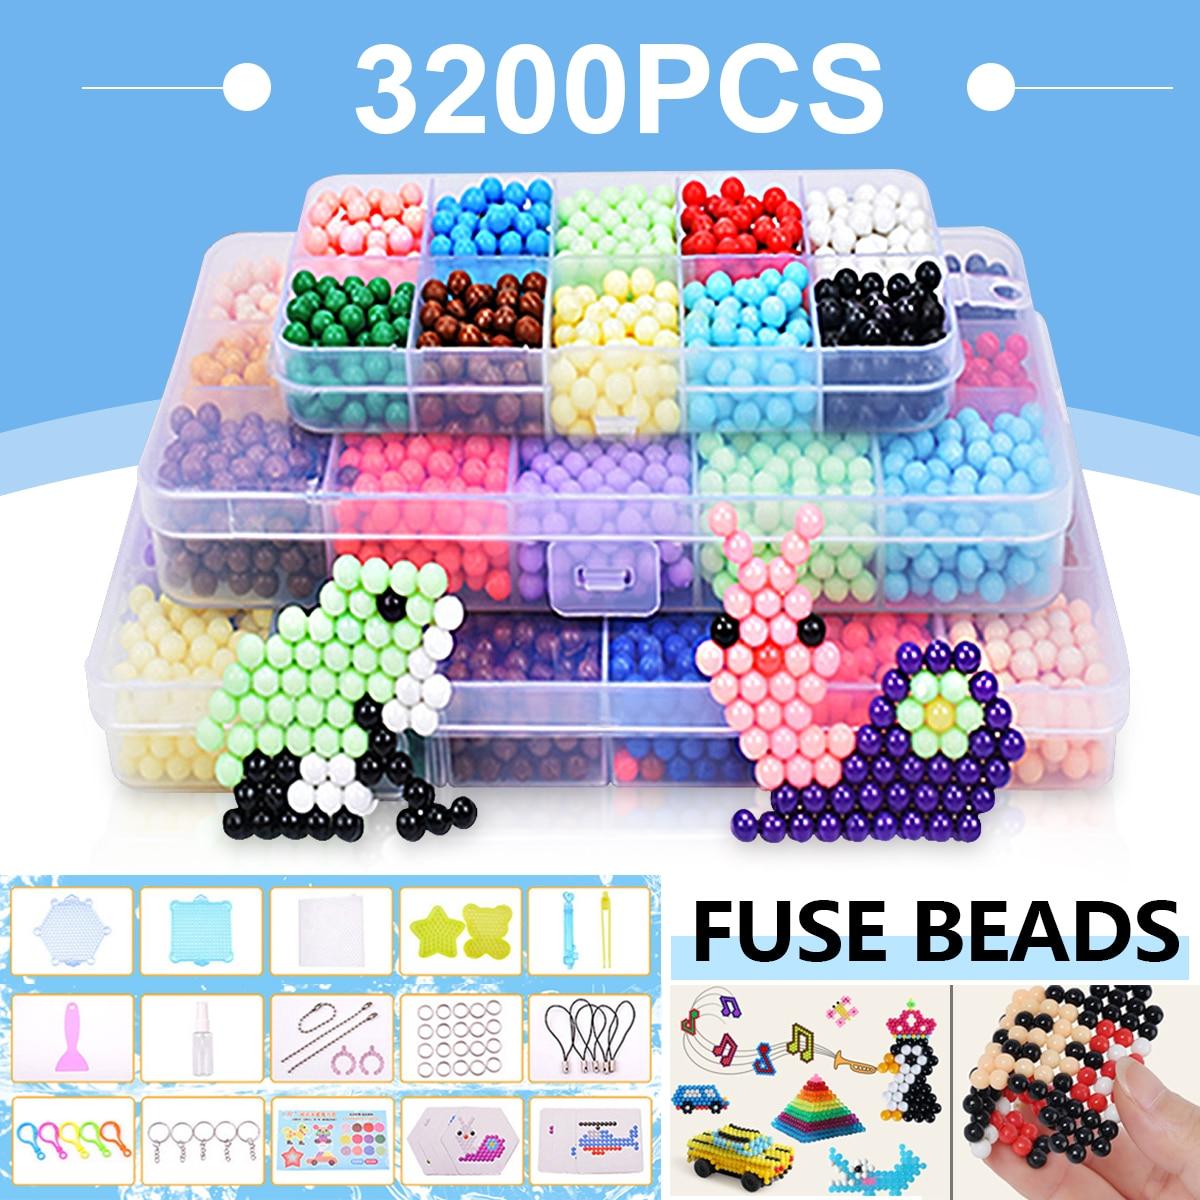 Unids 3200 piezas de juguetes 24 colores caja Set MINI niños Diy juguetes fusible cuentas Plussize Pegboard hojas de planchar Pape